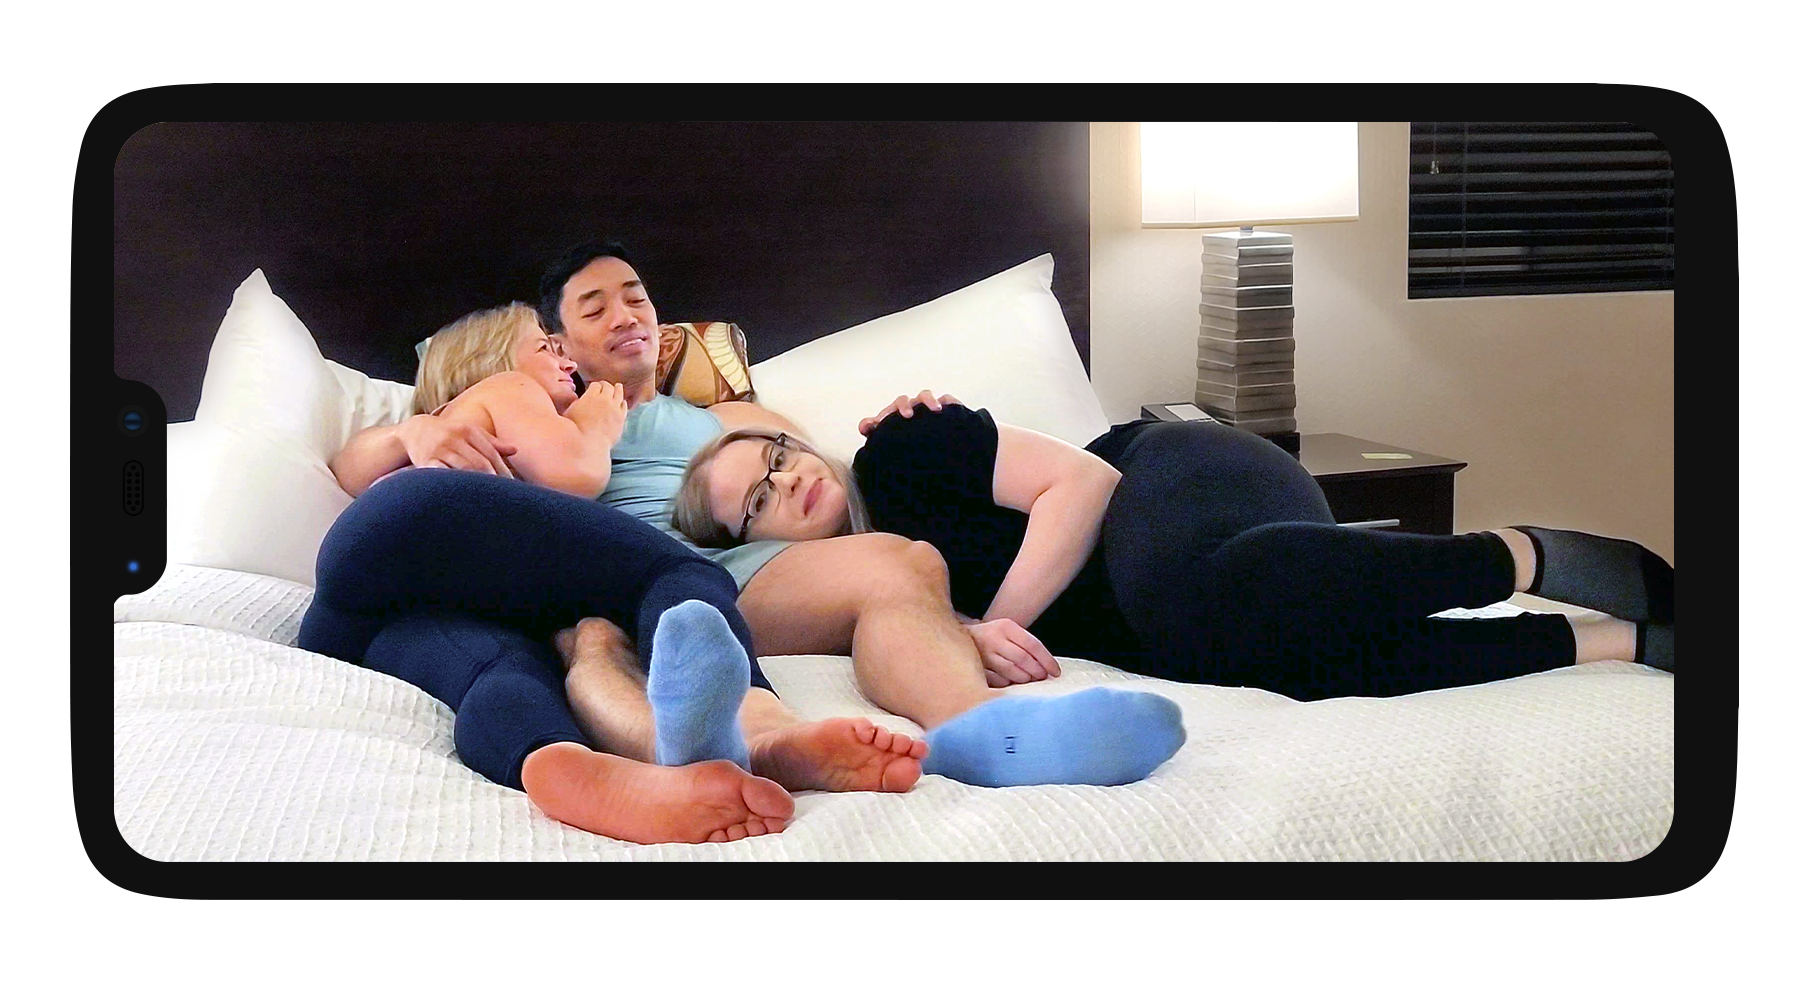 OnePlus Horizontal Three Cuddles